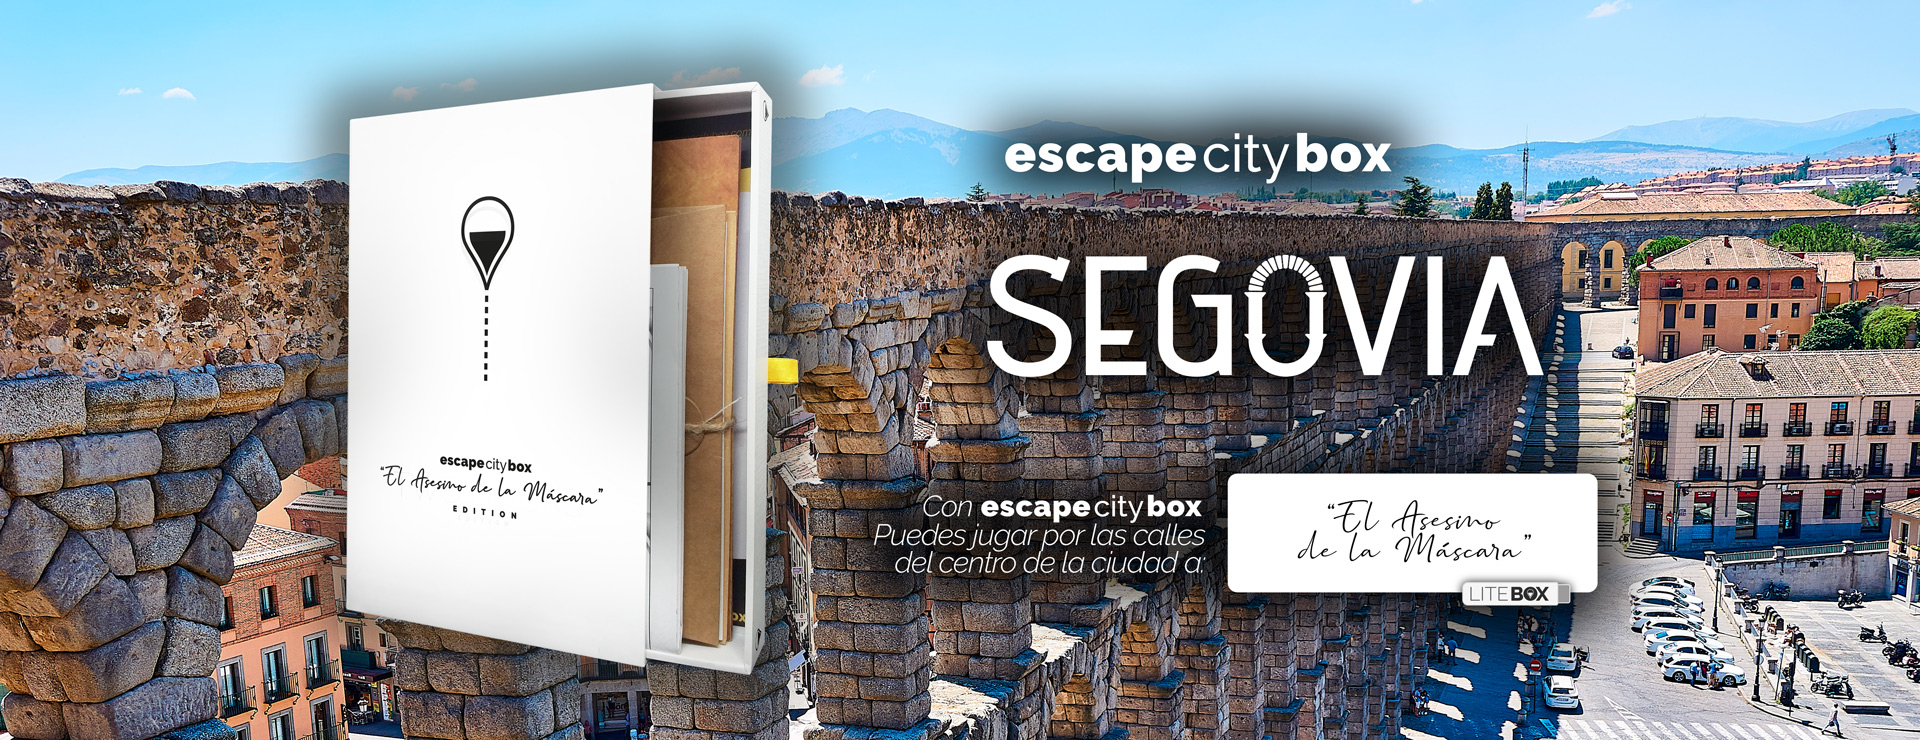 City Escape en Segovia